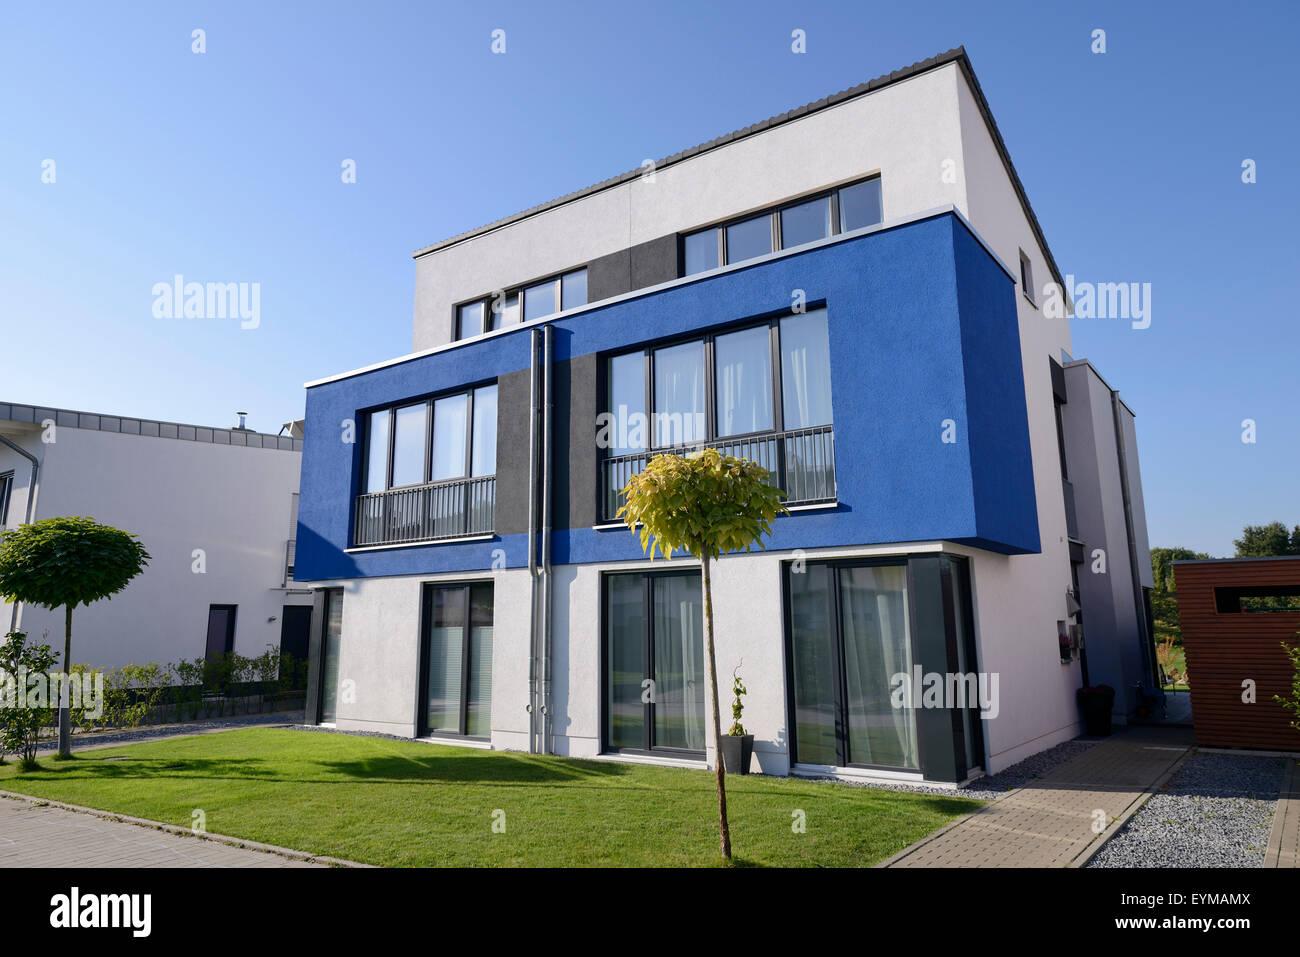 Modern house with garage Germany North RhineWestphalia Cologne